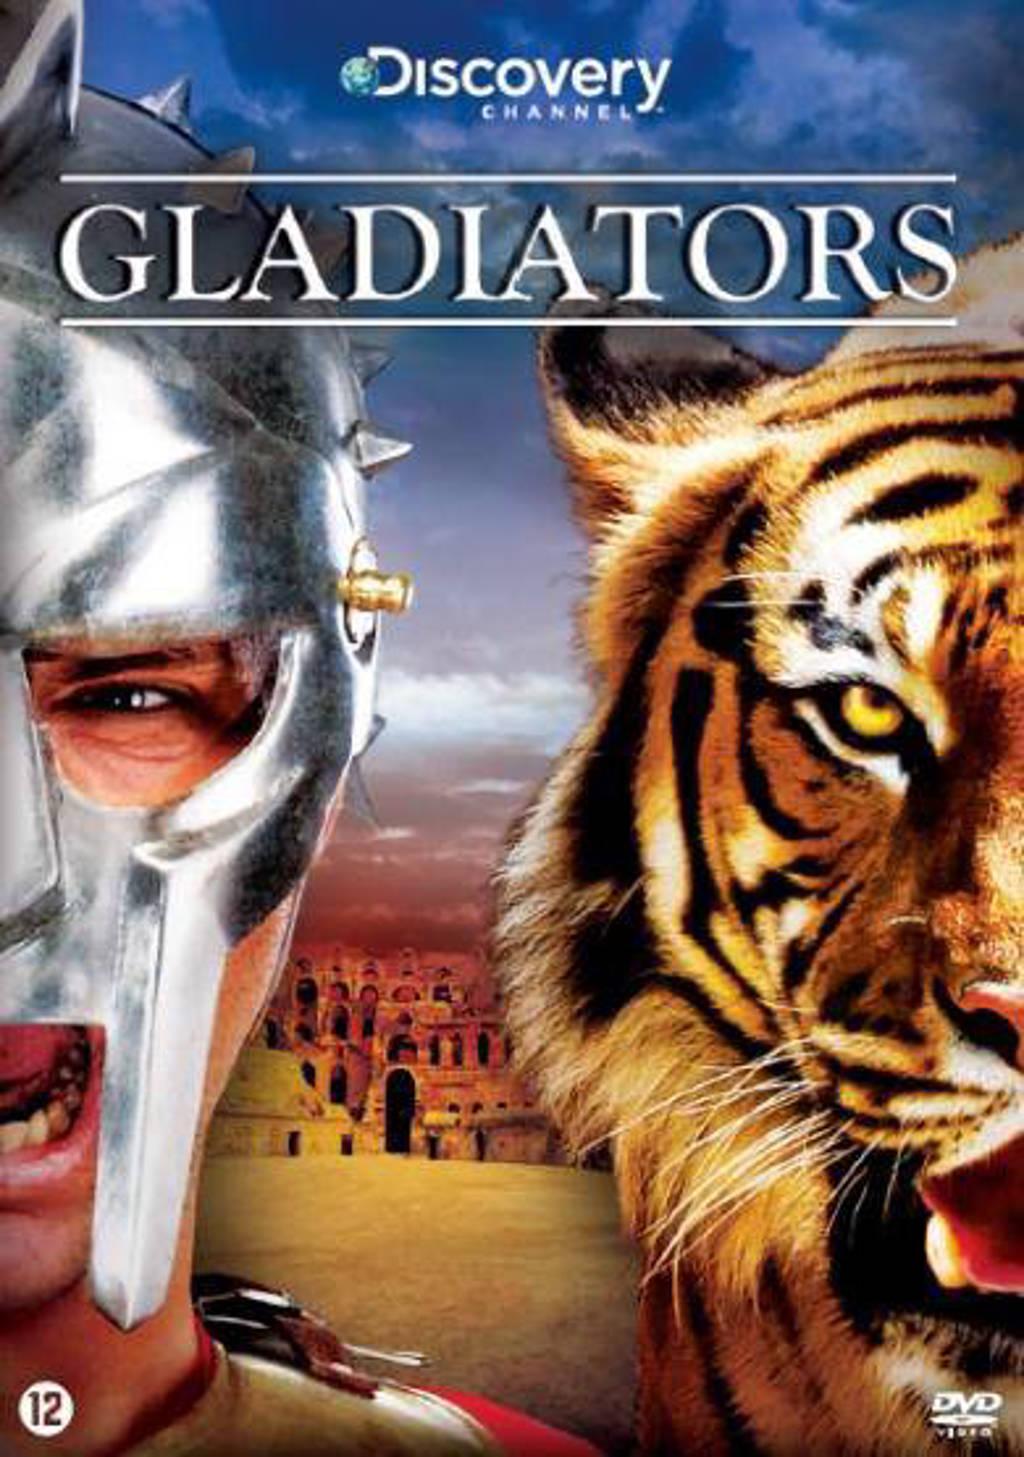 Gladiators (DVD)